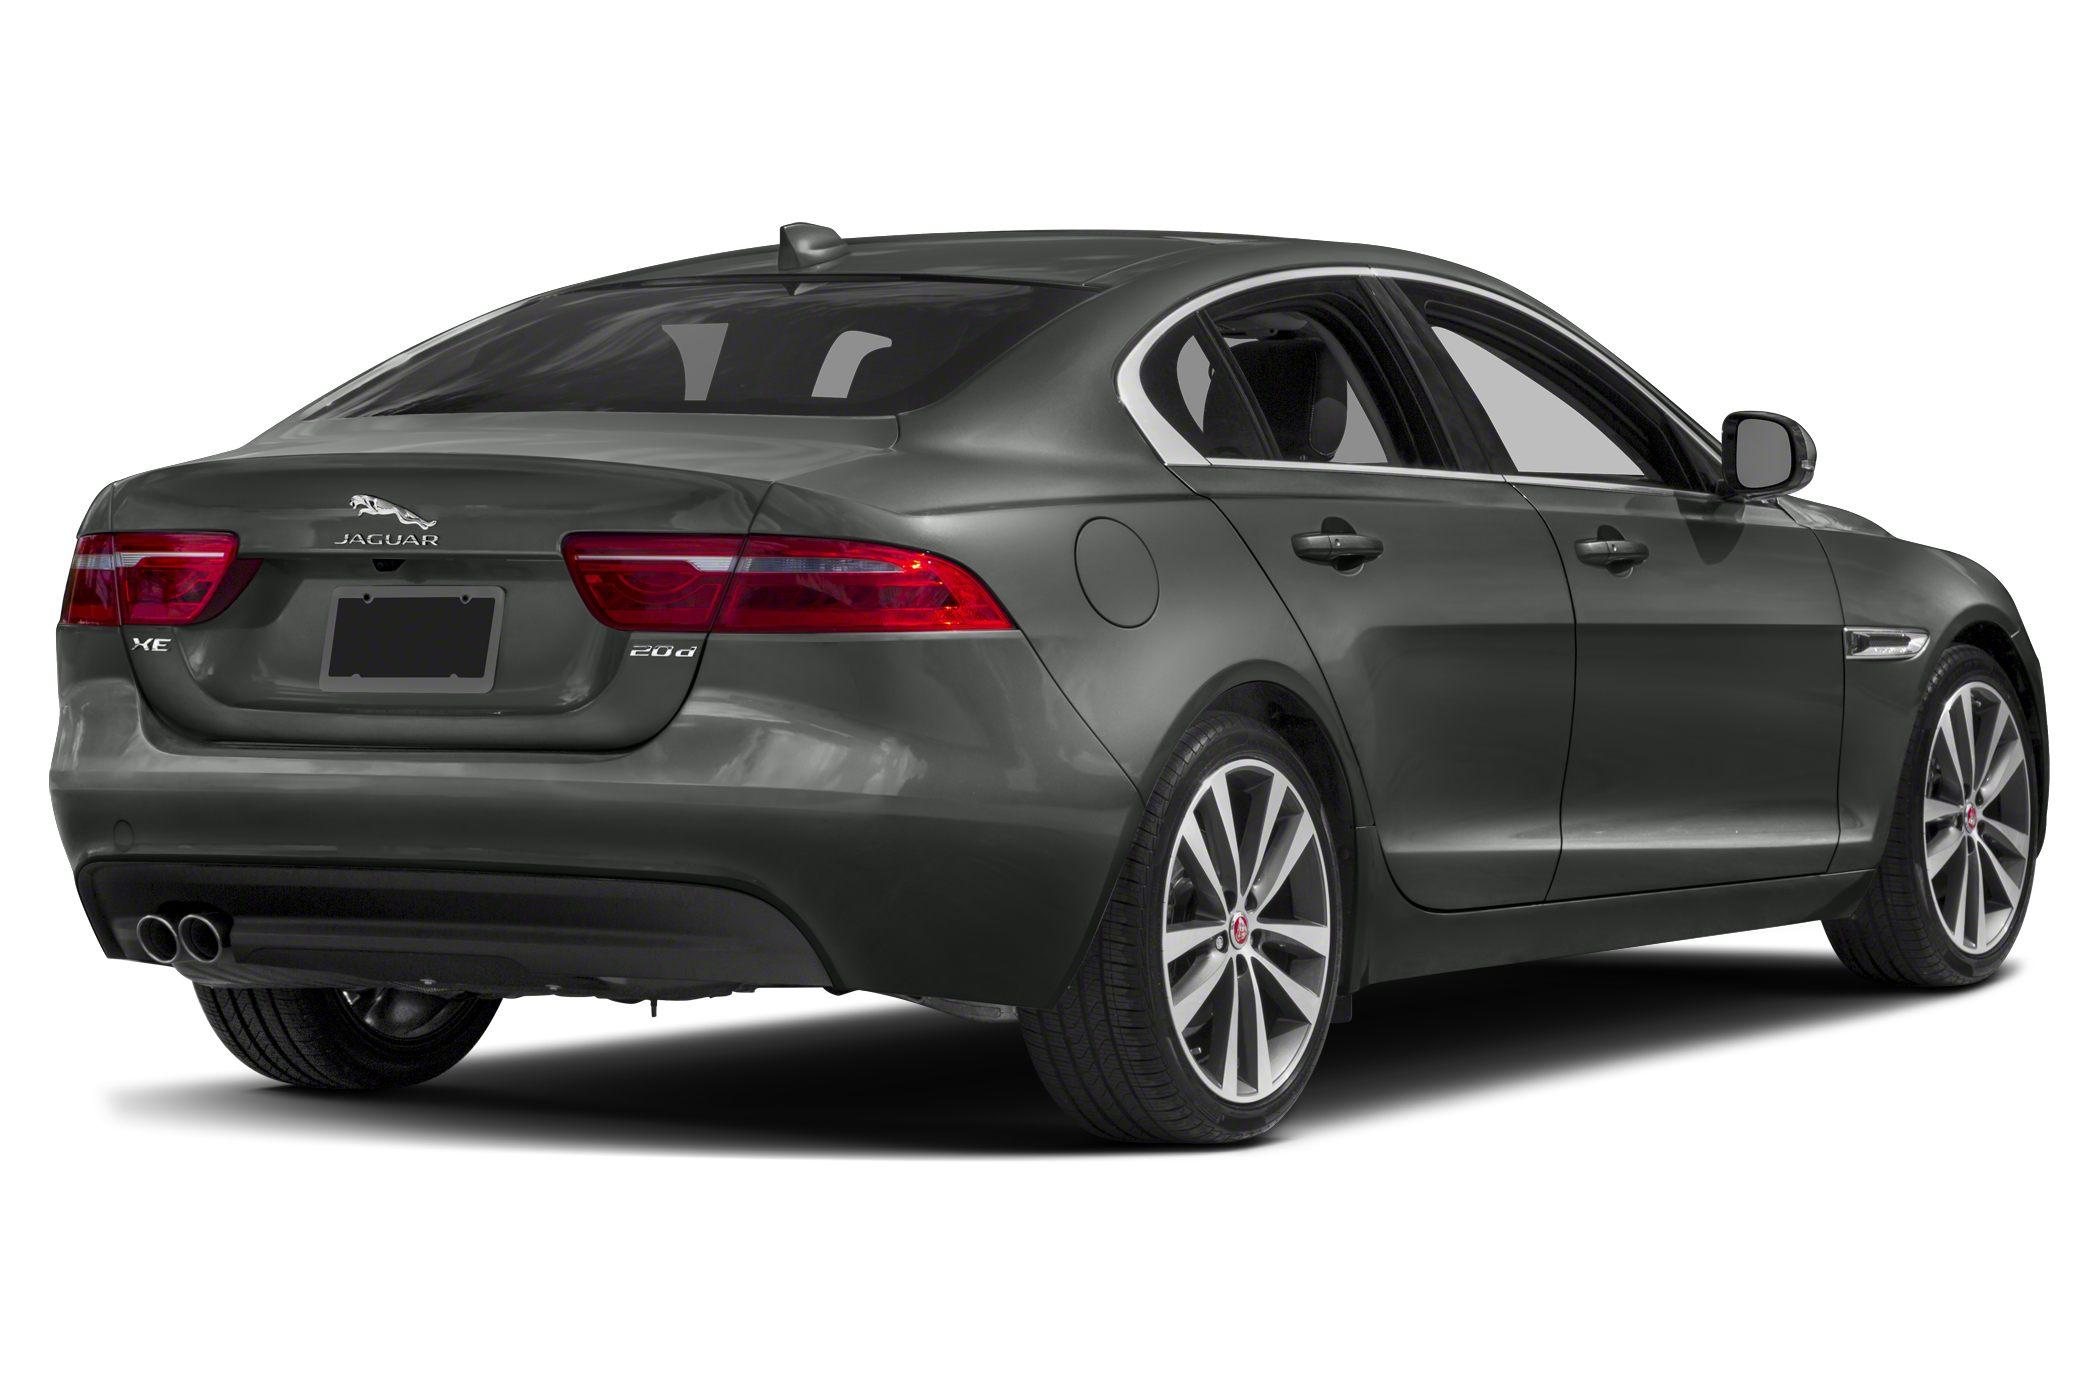 Jaguar Xe Release >> 2019 Jaguar Xe Deals Prices Incentives Leases Overview Carsdirect